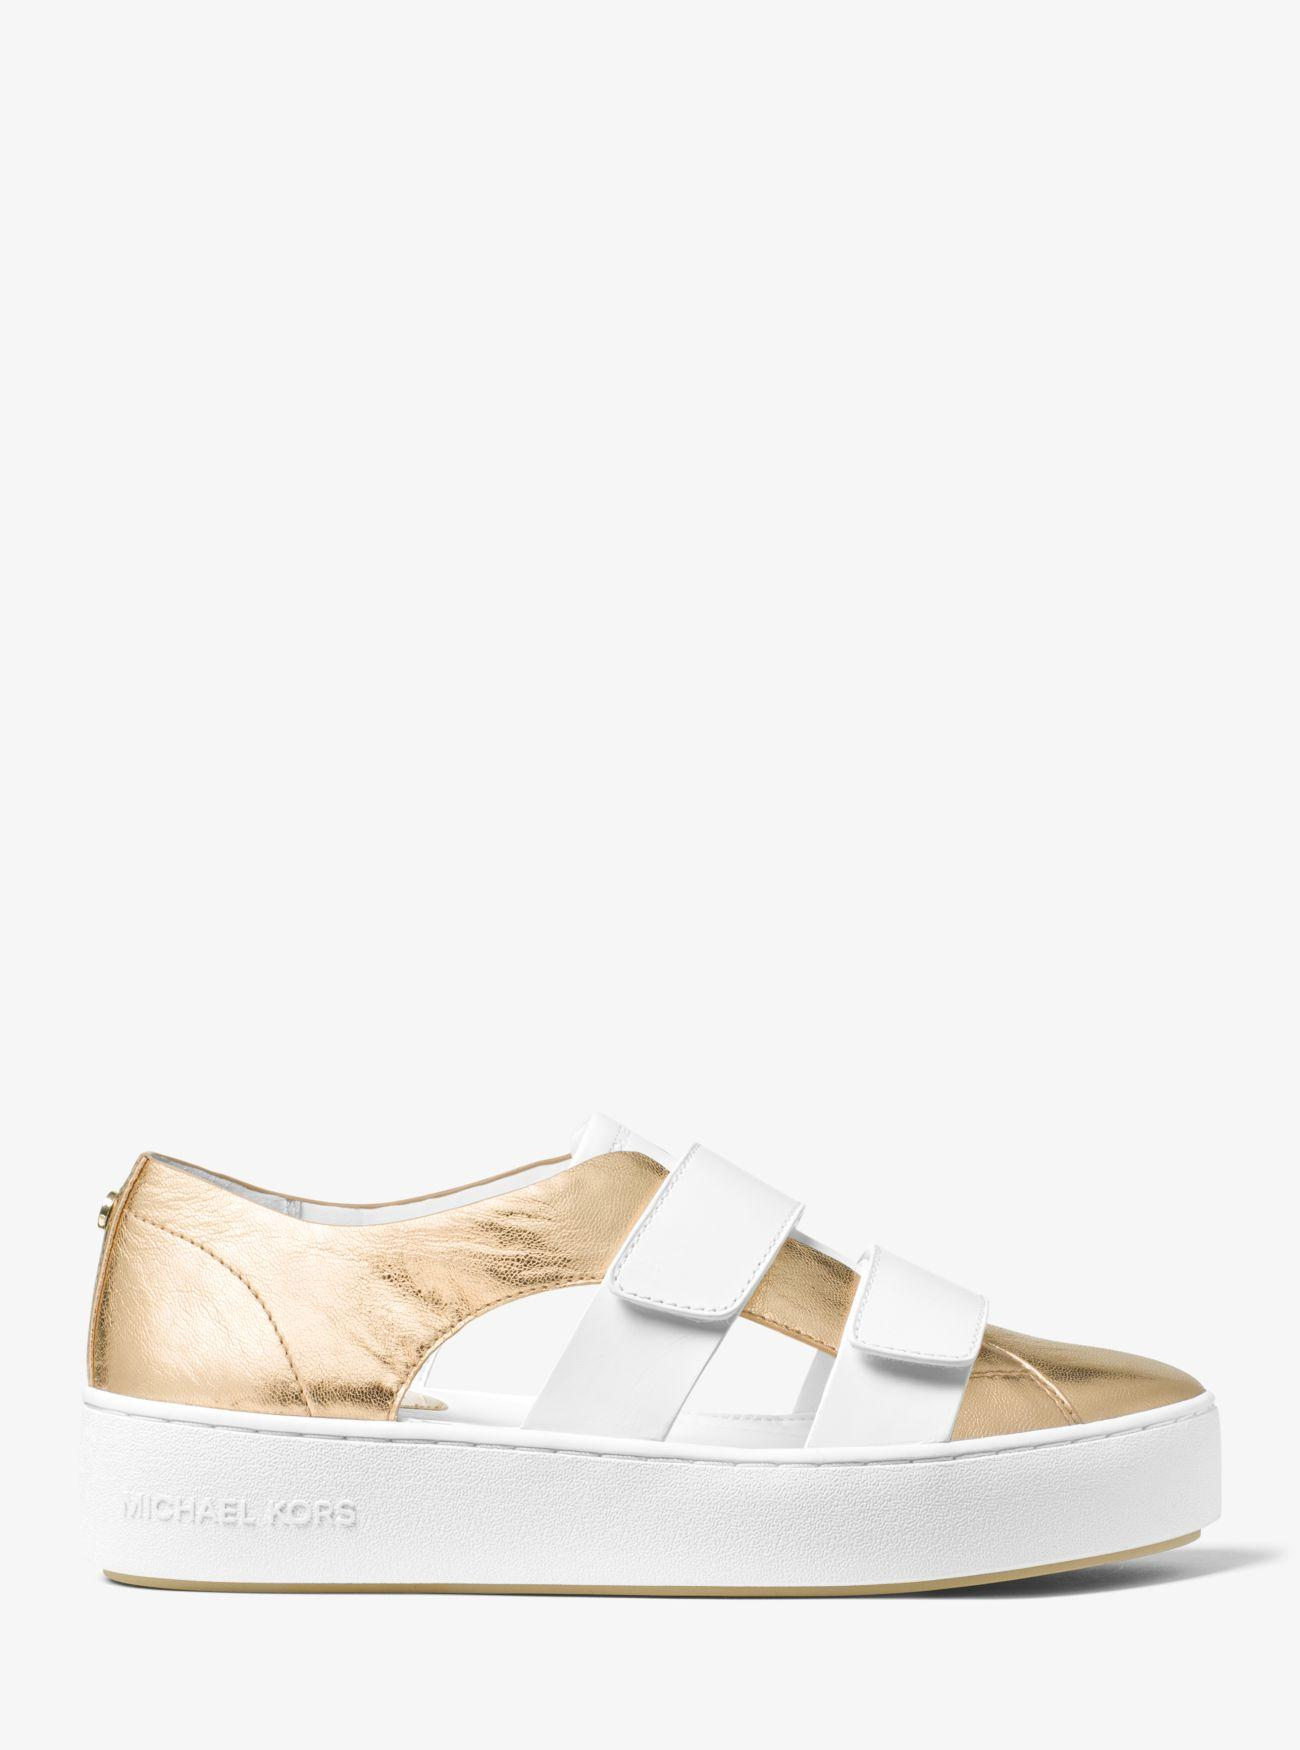 Michael Kors Beckett Leather Sneaker in White/Pale Gold (White)